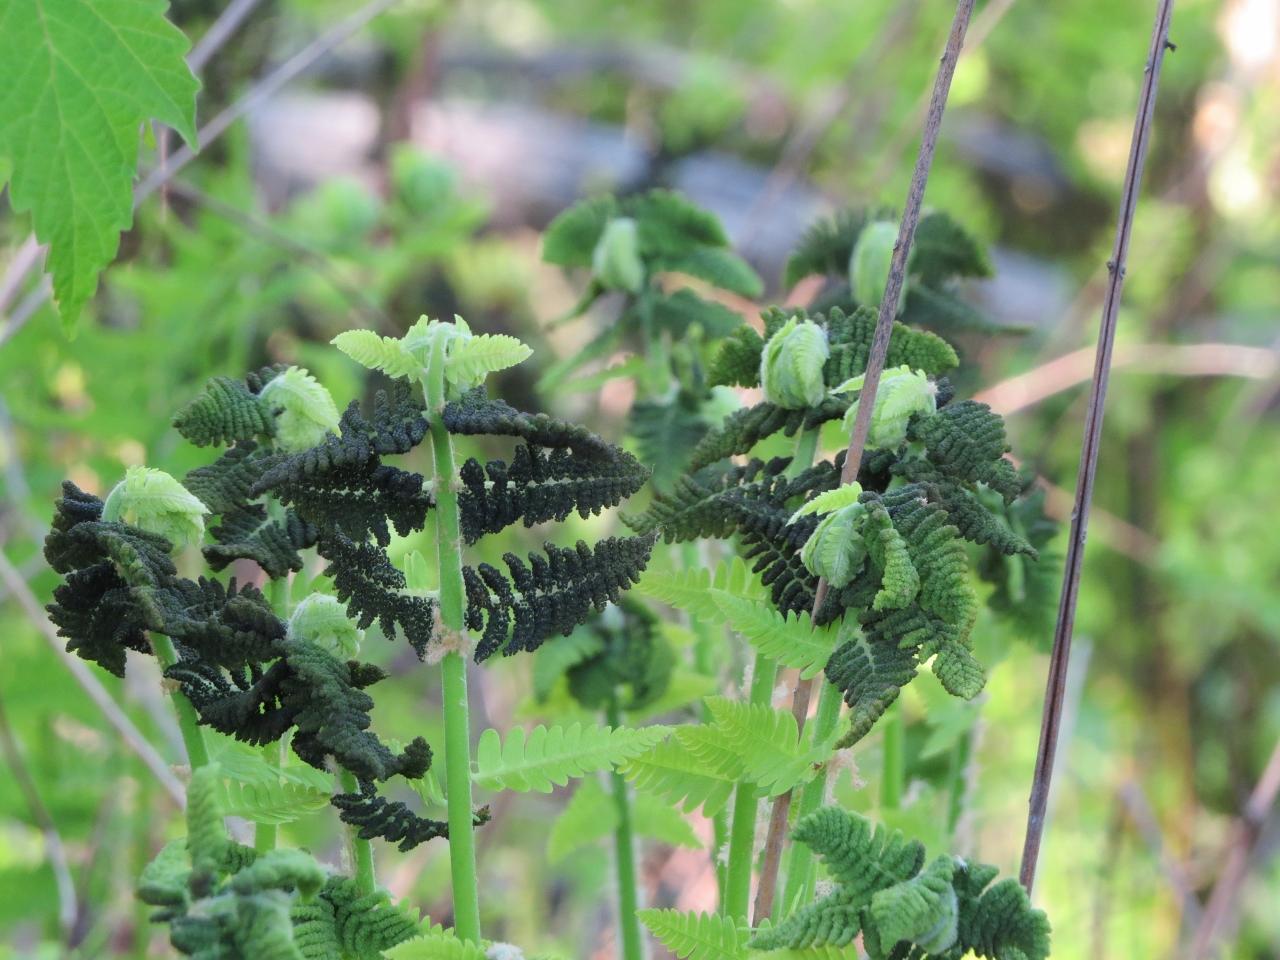 Ferns - weird two shades of green (1280x960)